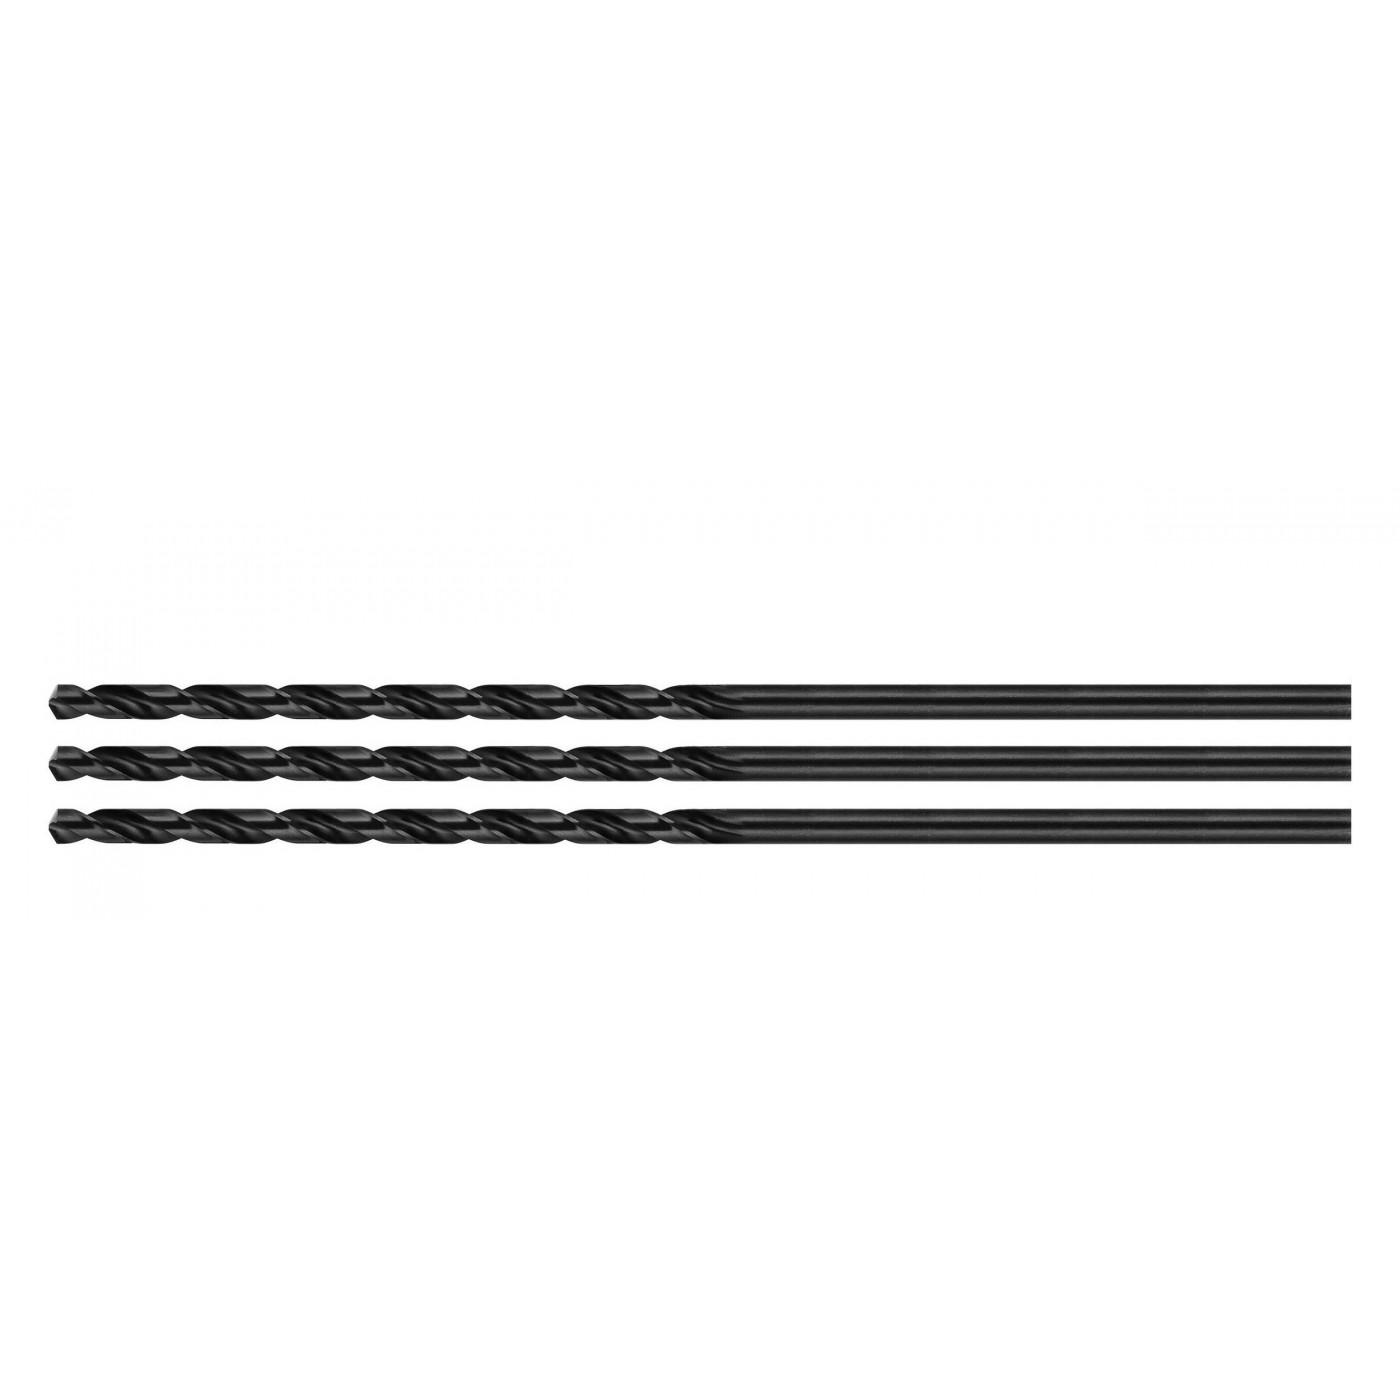 Set of 3 metal drill bits, extra long (7.0x350 mm)